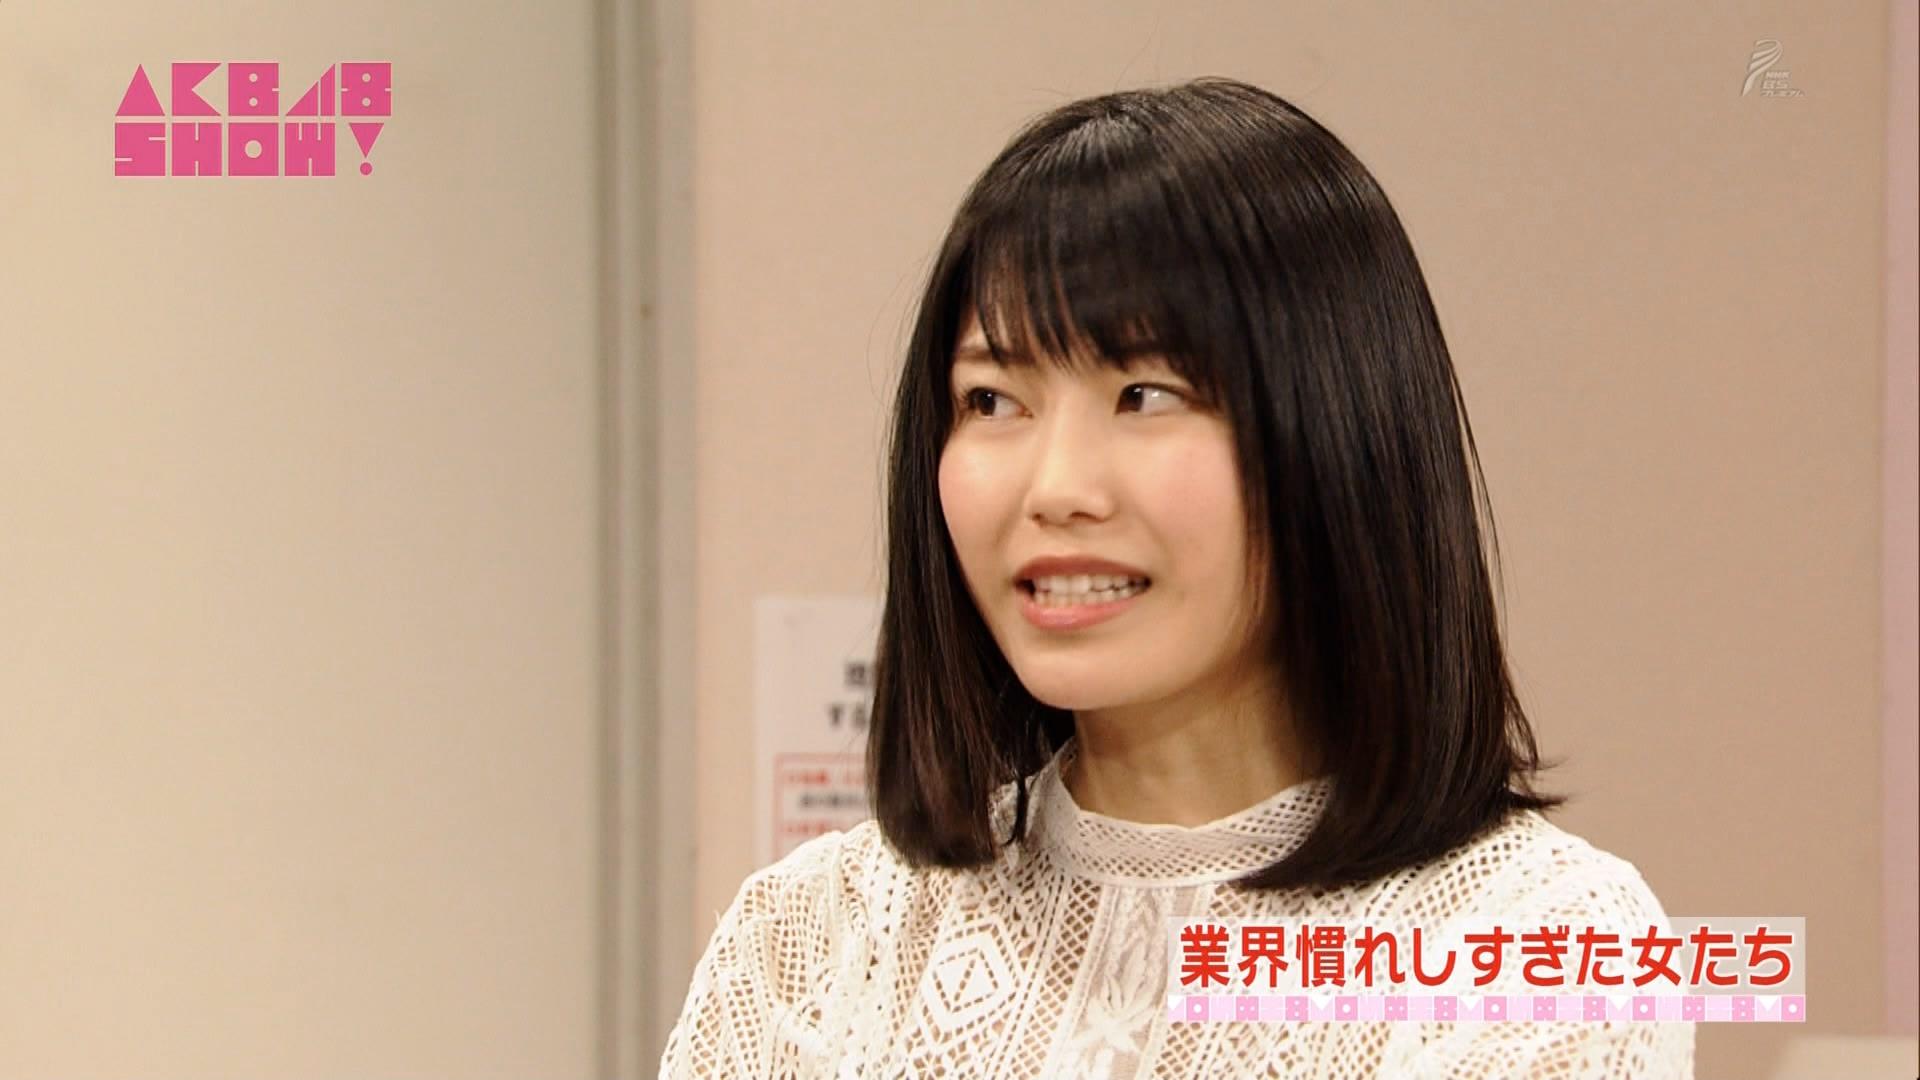 【AKB48】横山由依応援スレ596【ゆいはん】©2ch.netYouTube動画>6本 ->画像>349枚